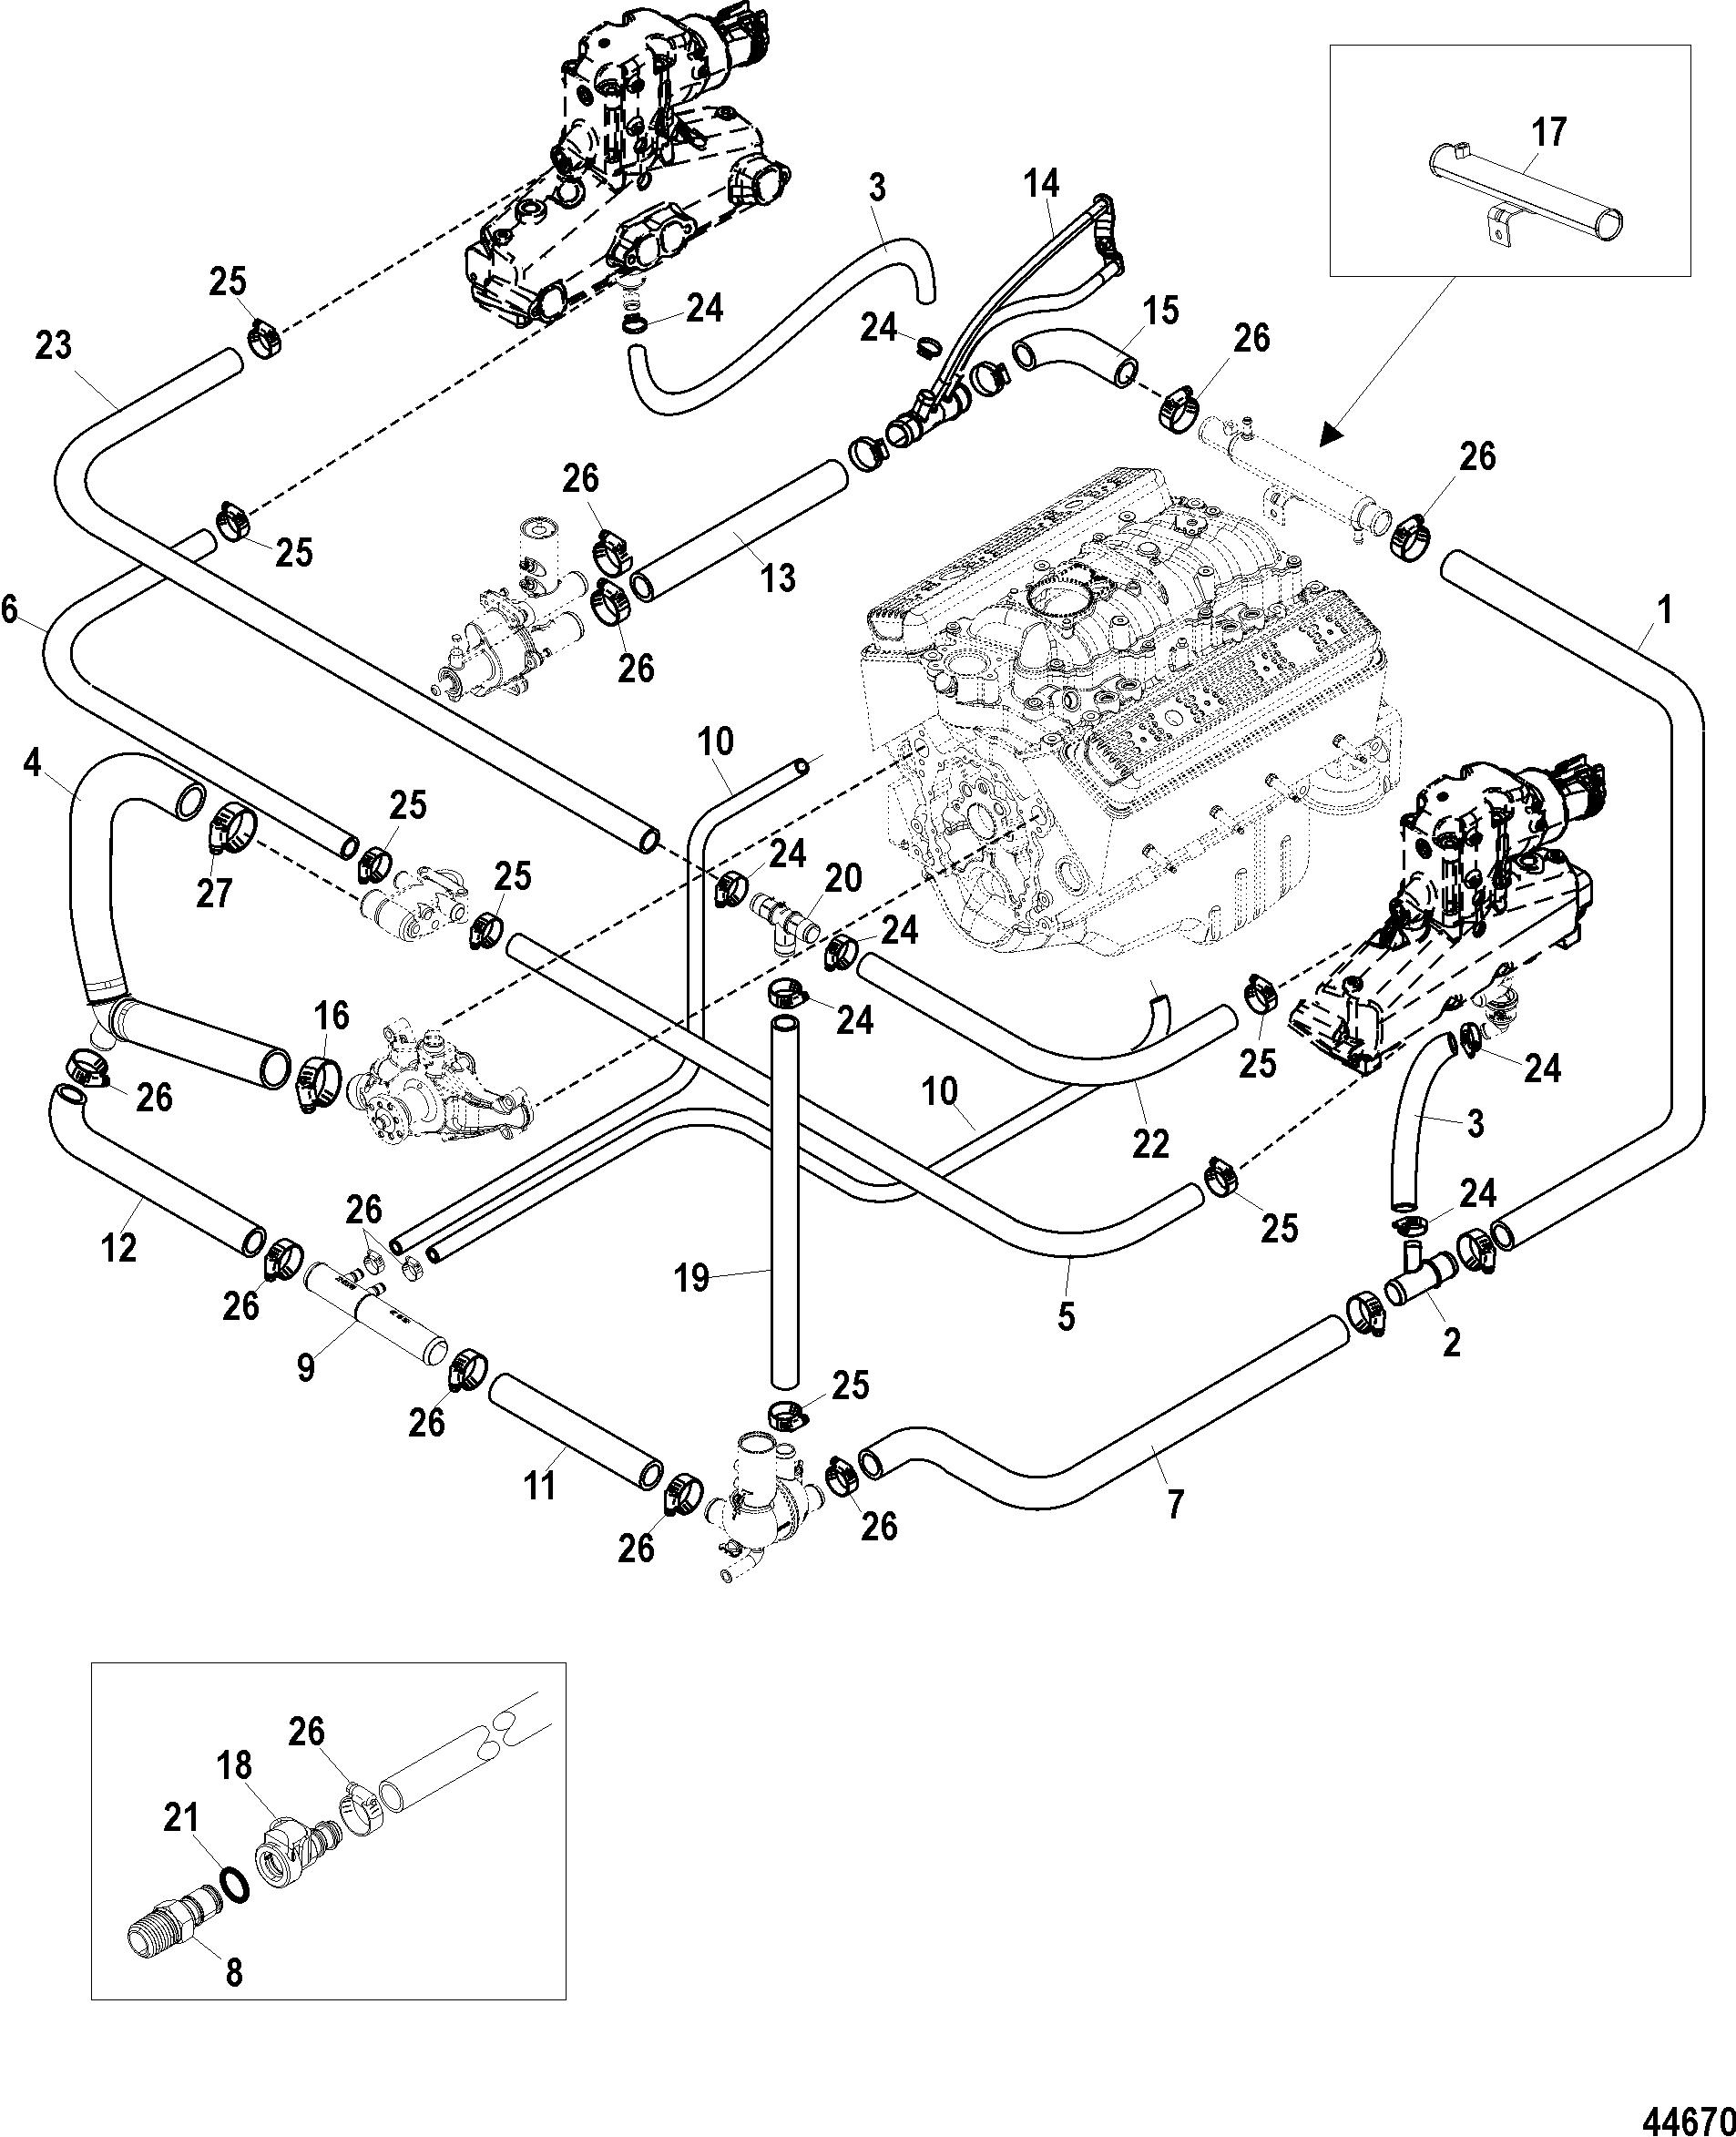 Mercruiser 5 0 Mpi Wiring Diagram